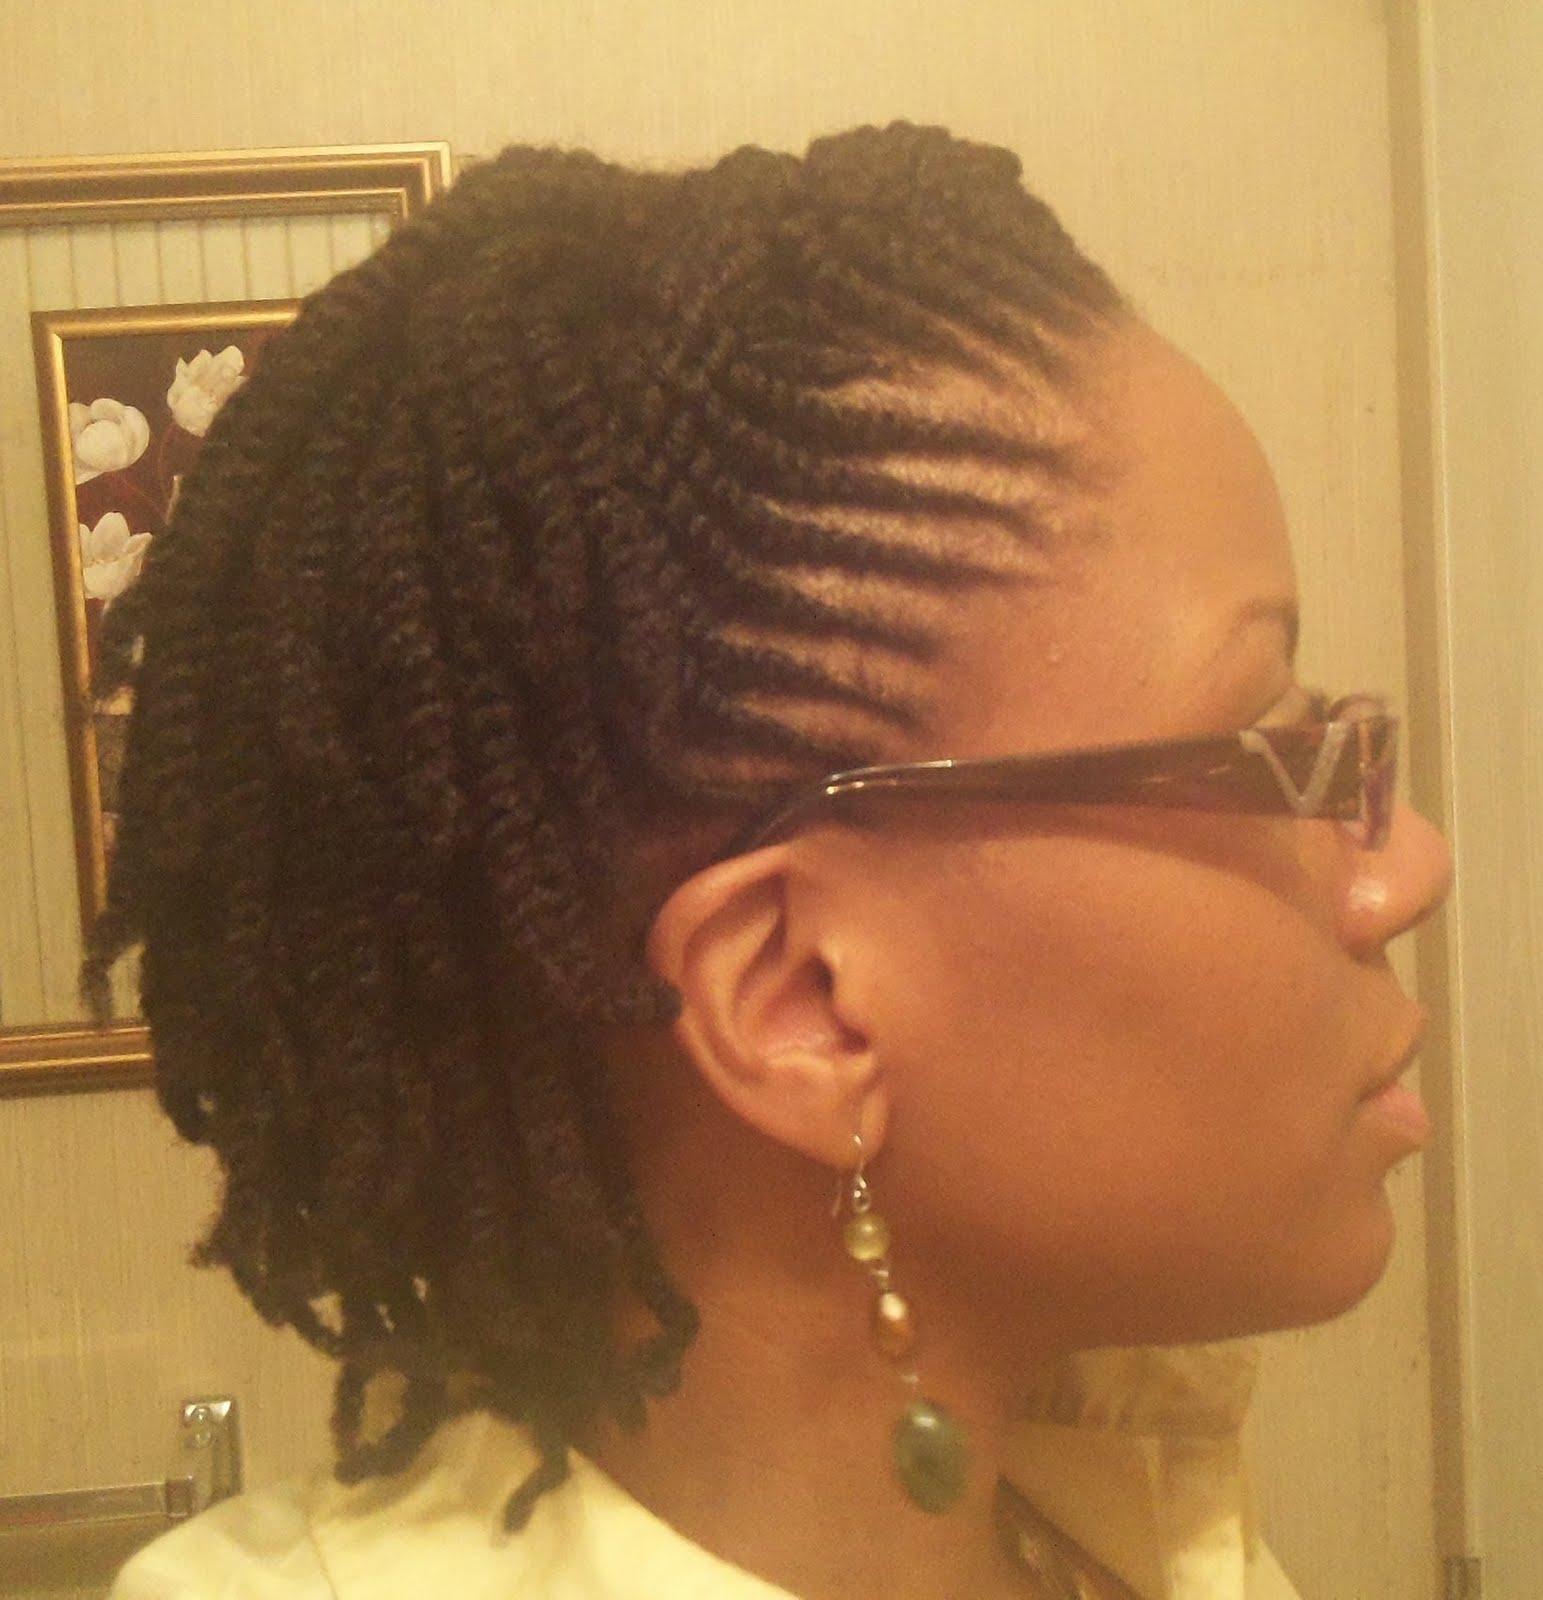 Enjoyable Keke52284 Conquering Natural Hair One Kink At A Time Short Hairstyles For Black Women Fulllsitofus